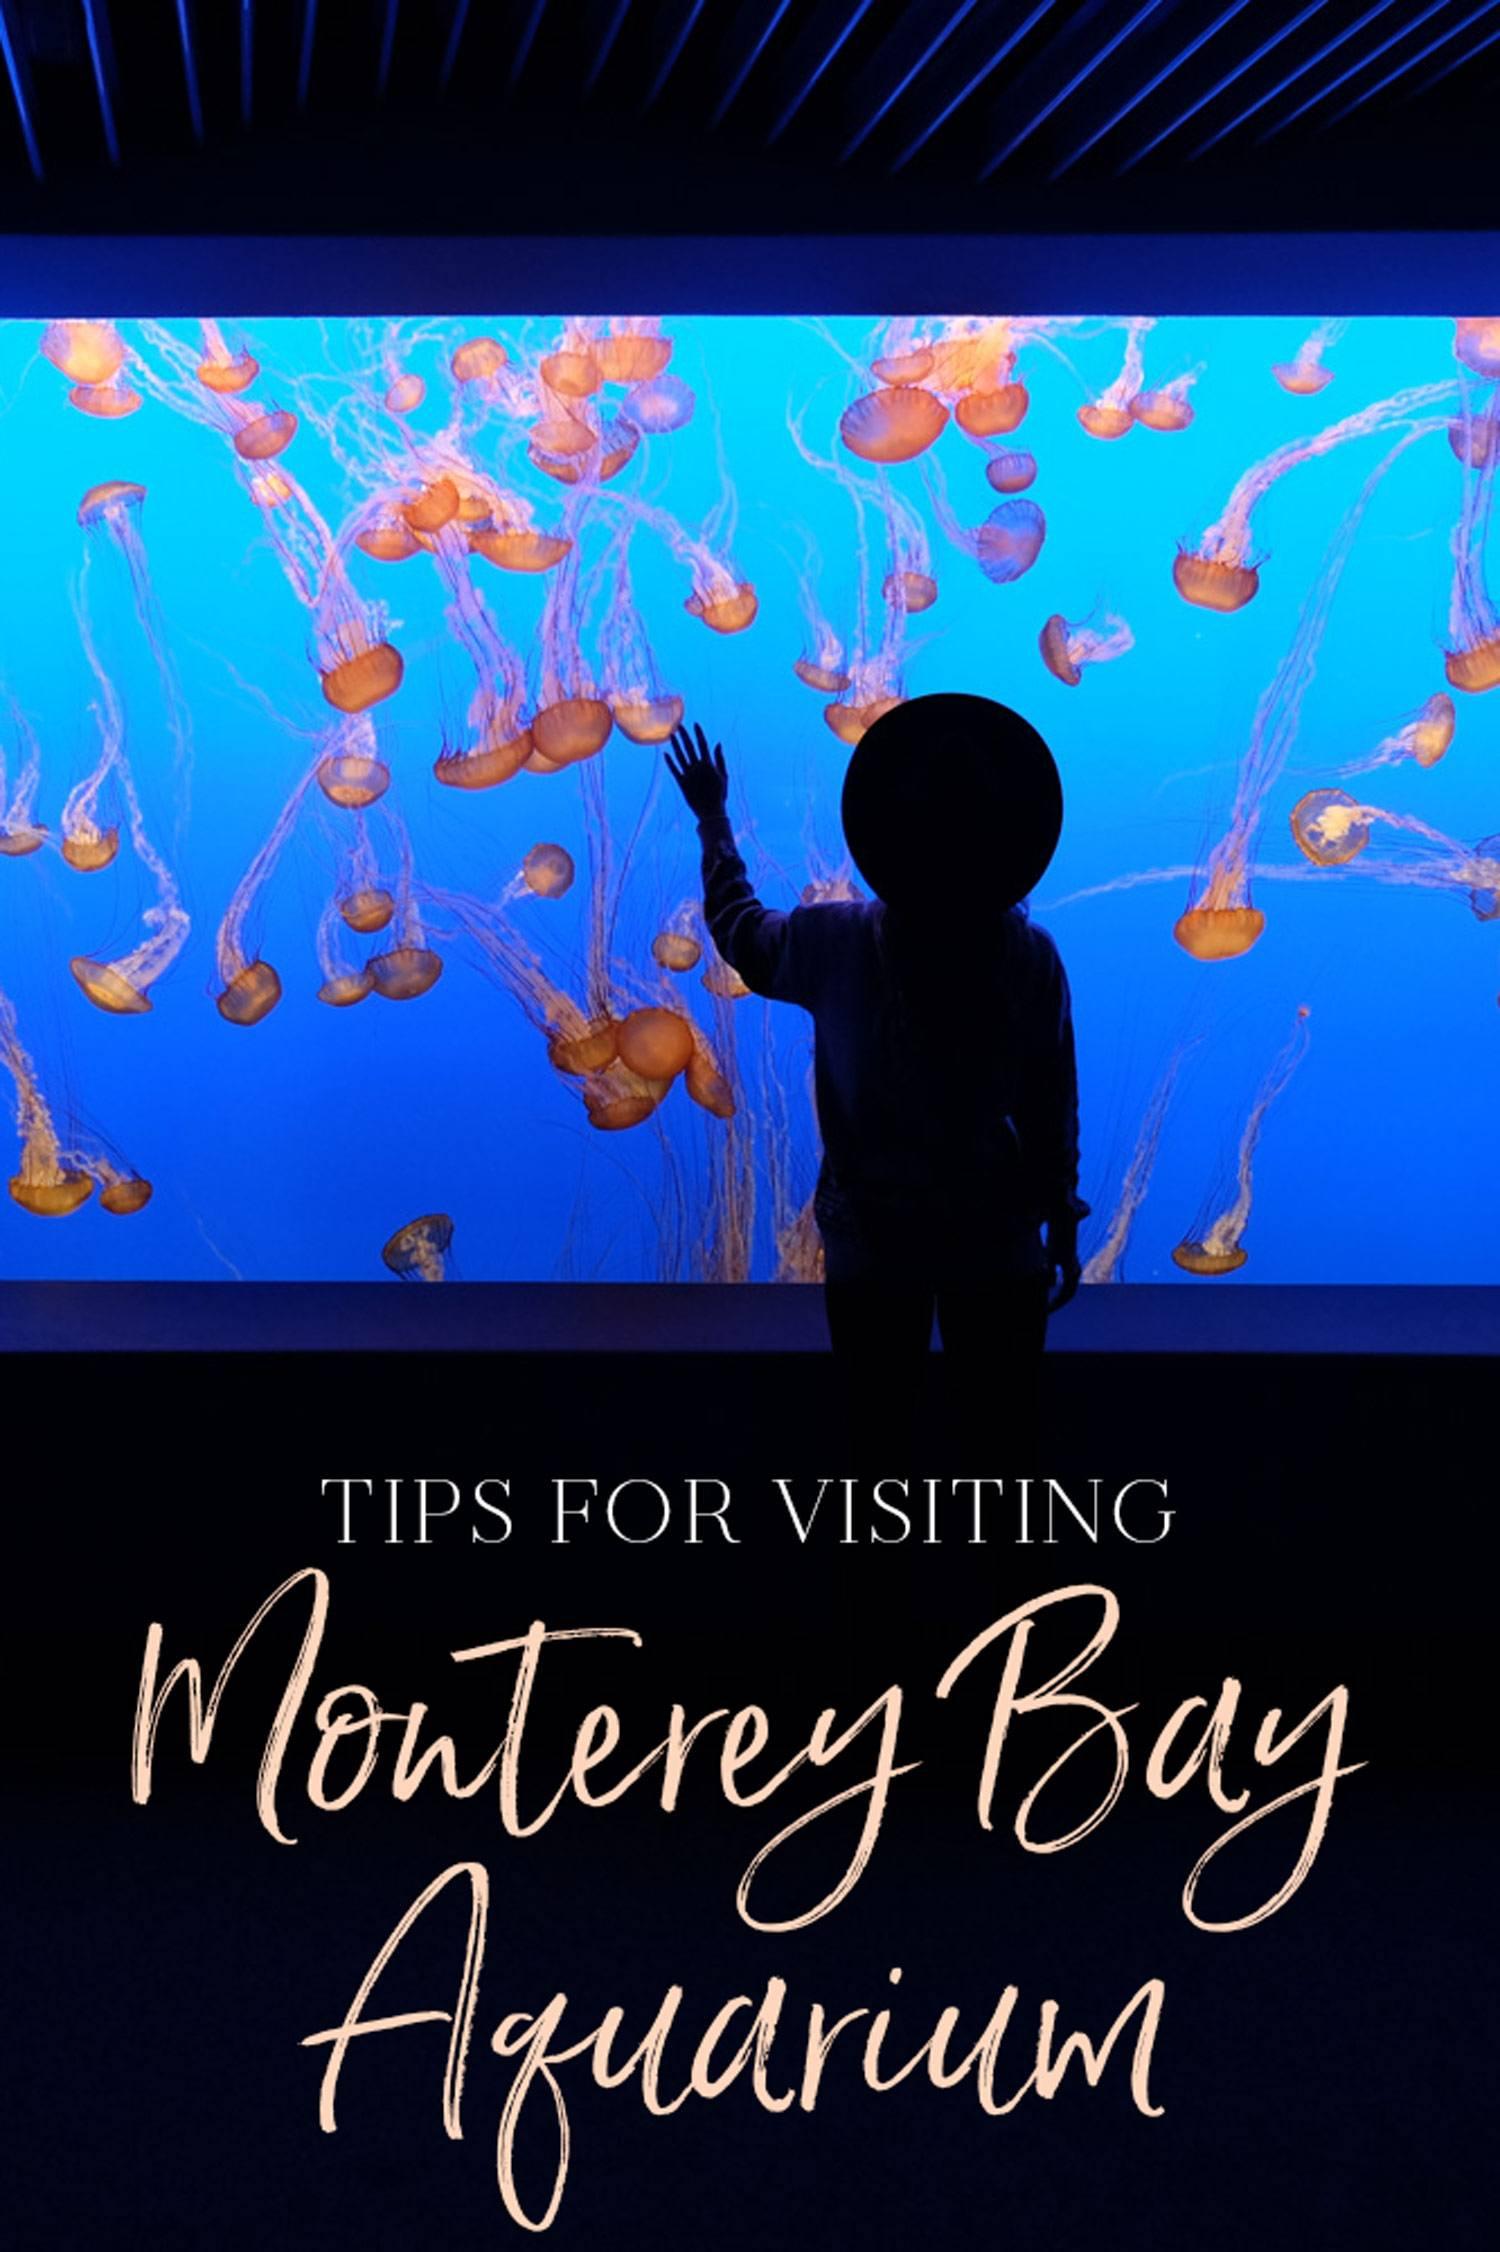 Tips for Visiting Monterey Bay Aquarium